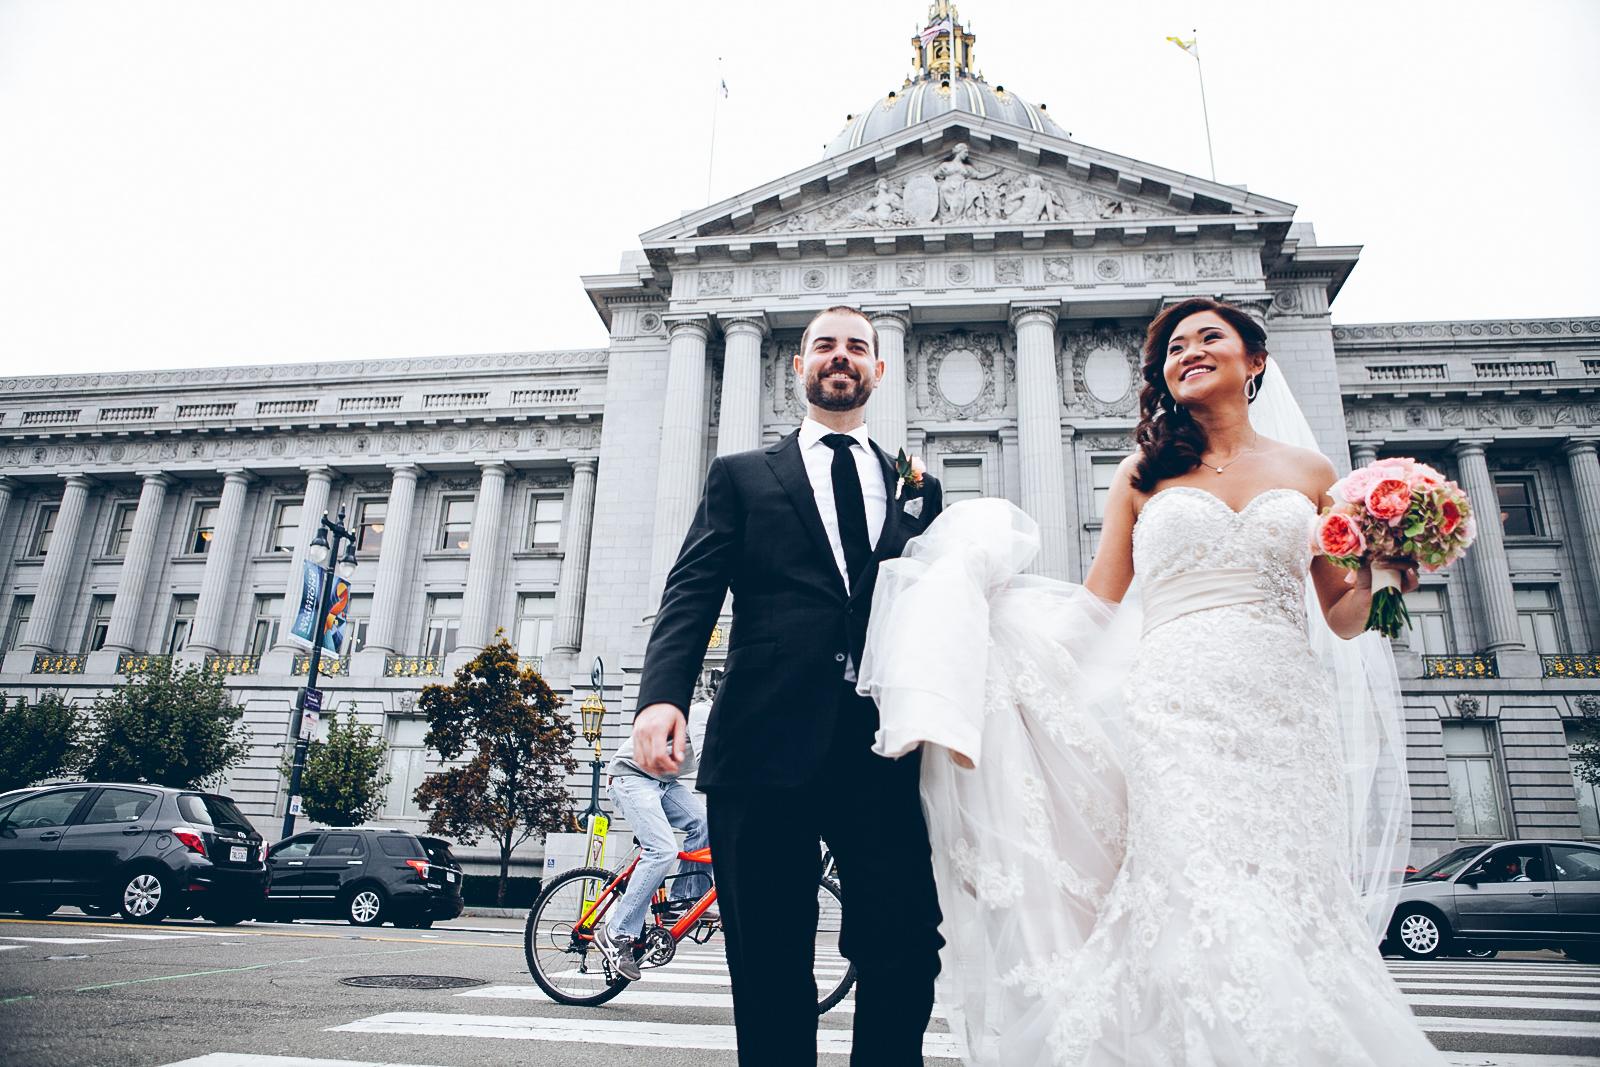 San_francisco_city_hall_wedding_photography_meegan_travis_ebony_siovhan_bokeh_photography_59.jpg